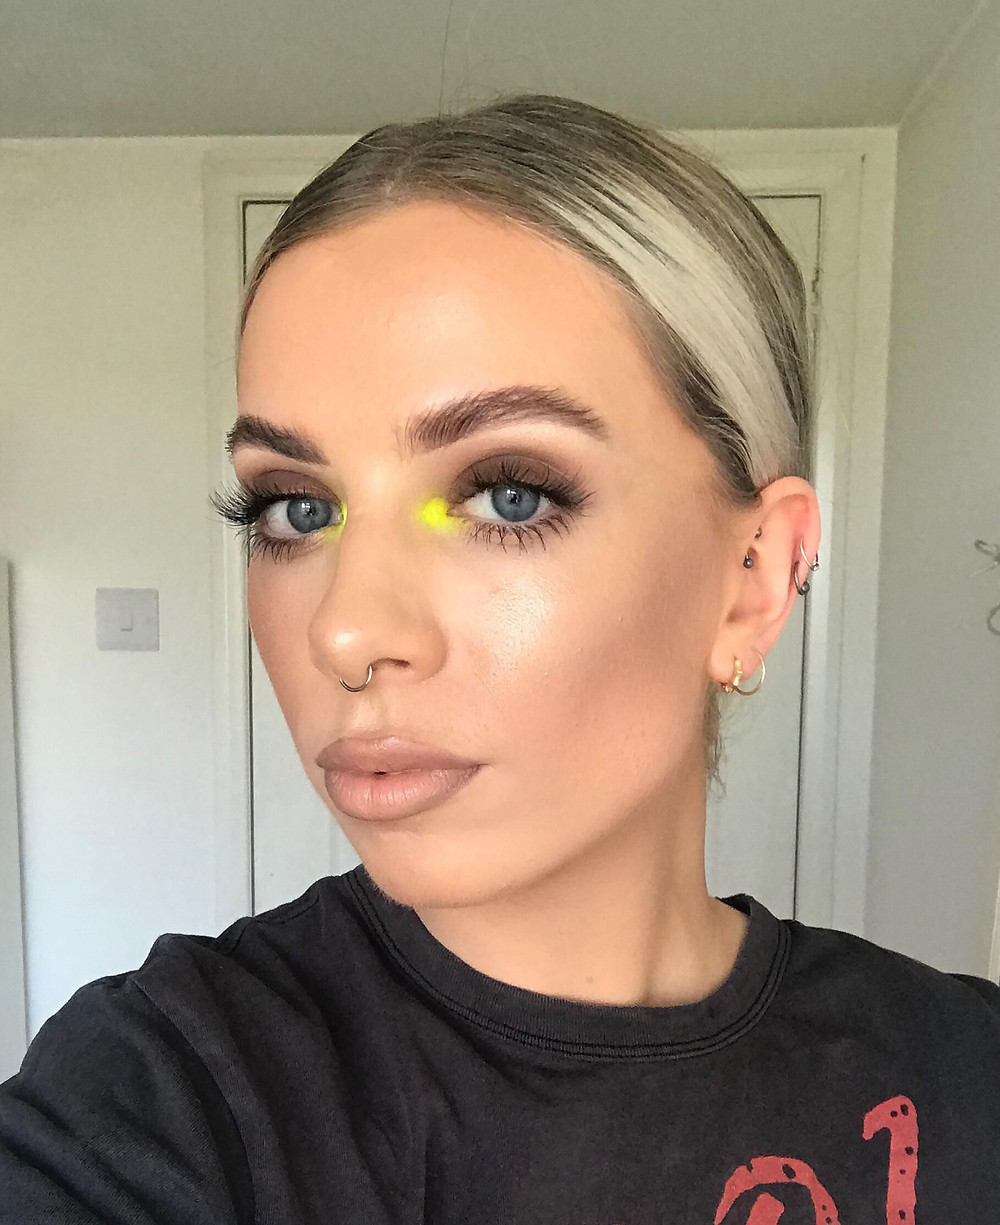 pops of neon, tendência de maquiagem neon, pontos de neon, 2020 makeup trend